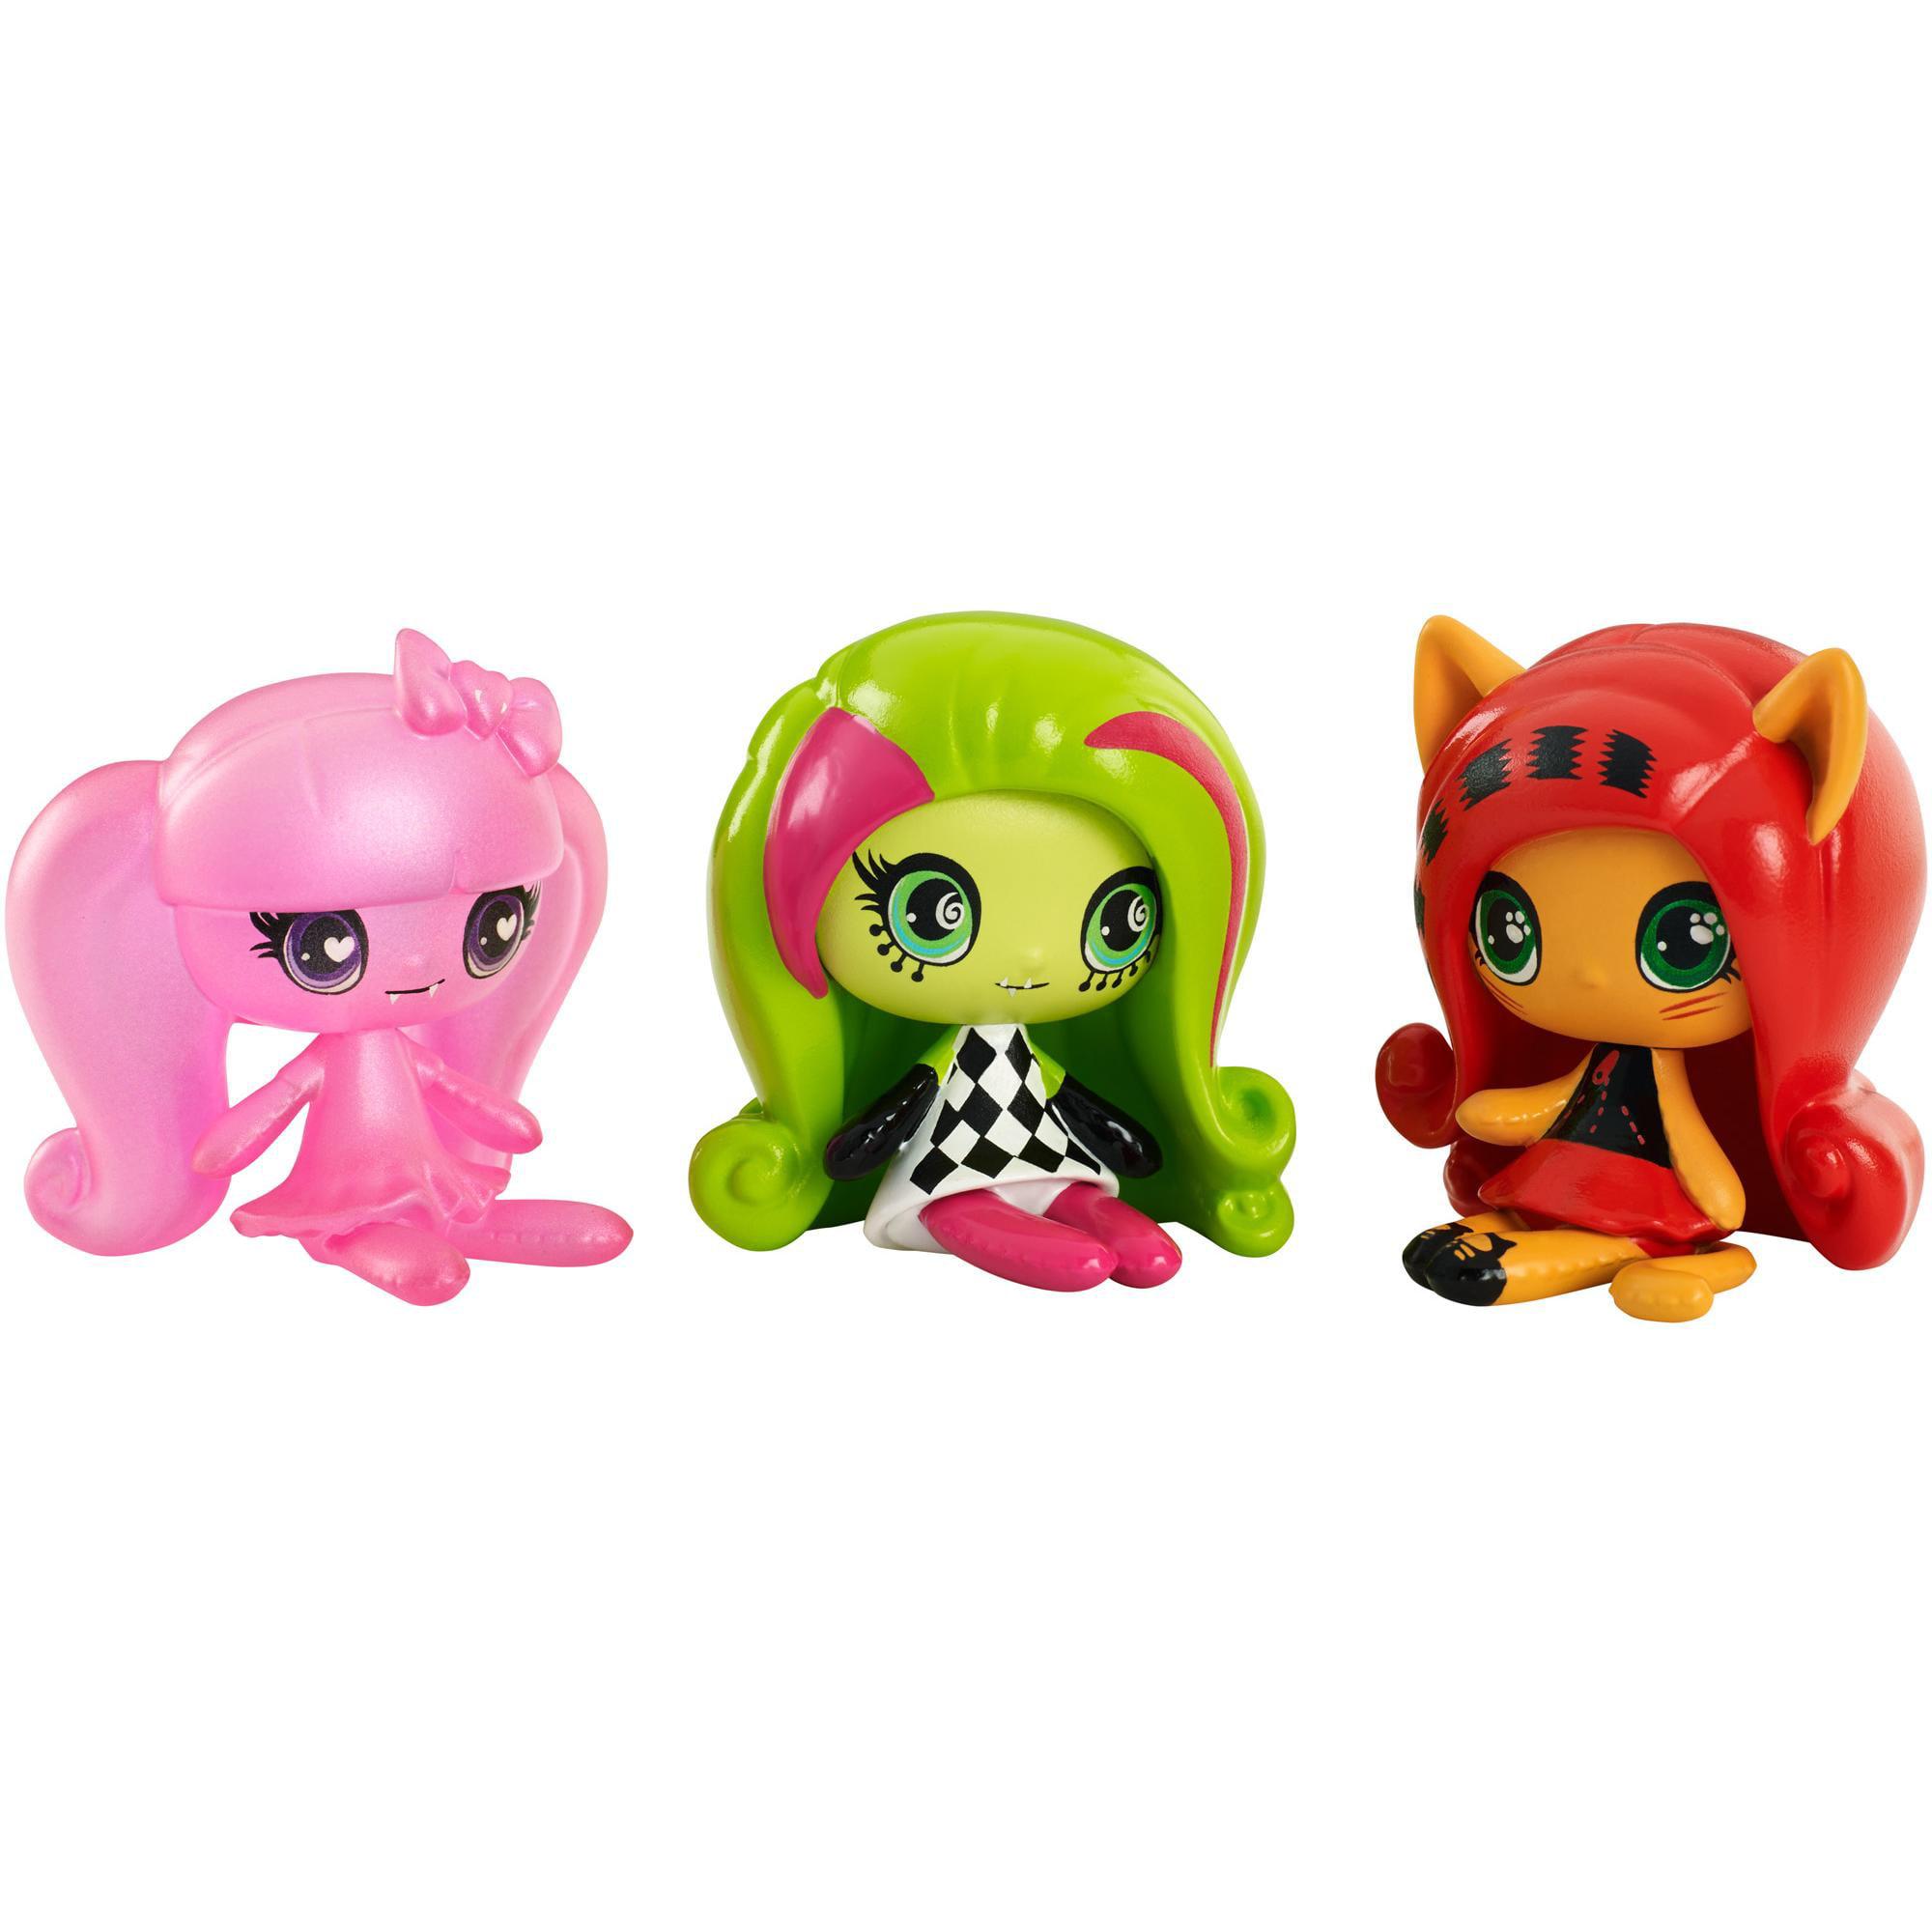 Monster High Minis, 3 Pack by MATTEL INC.